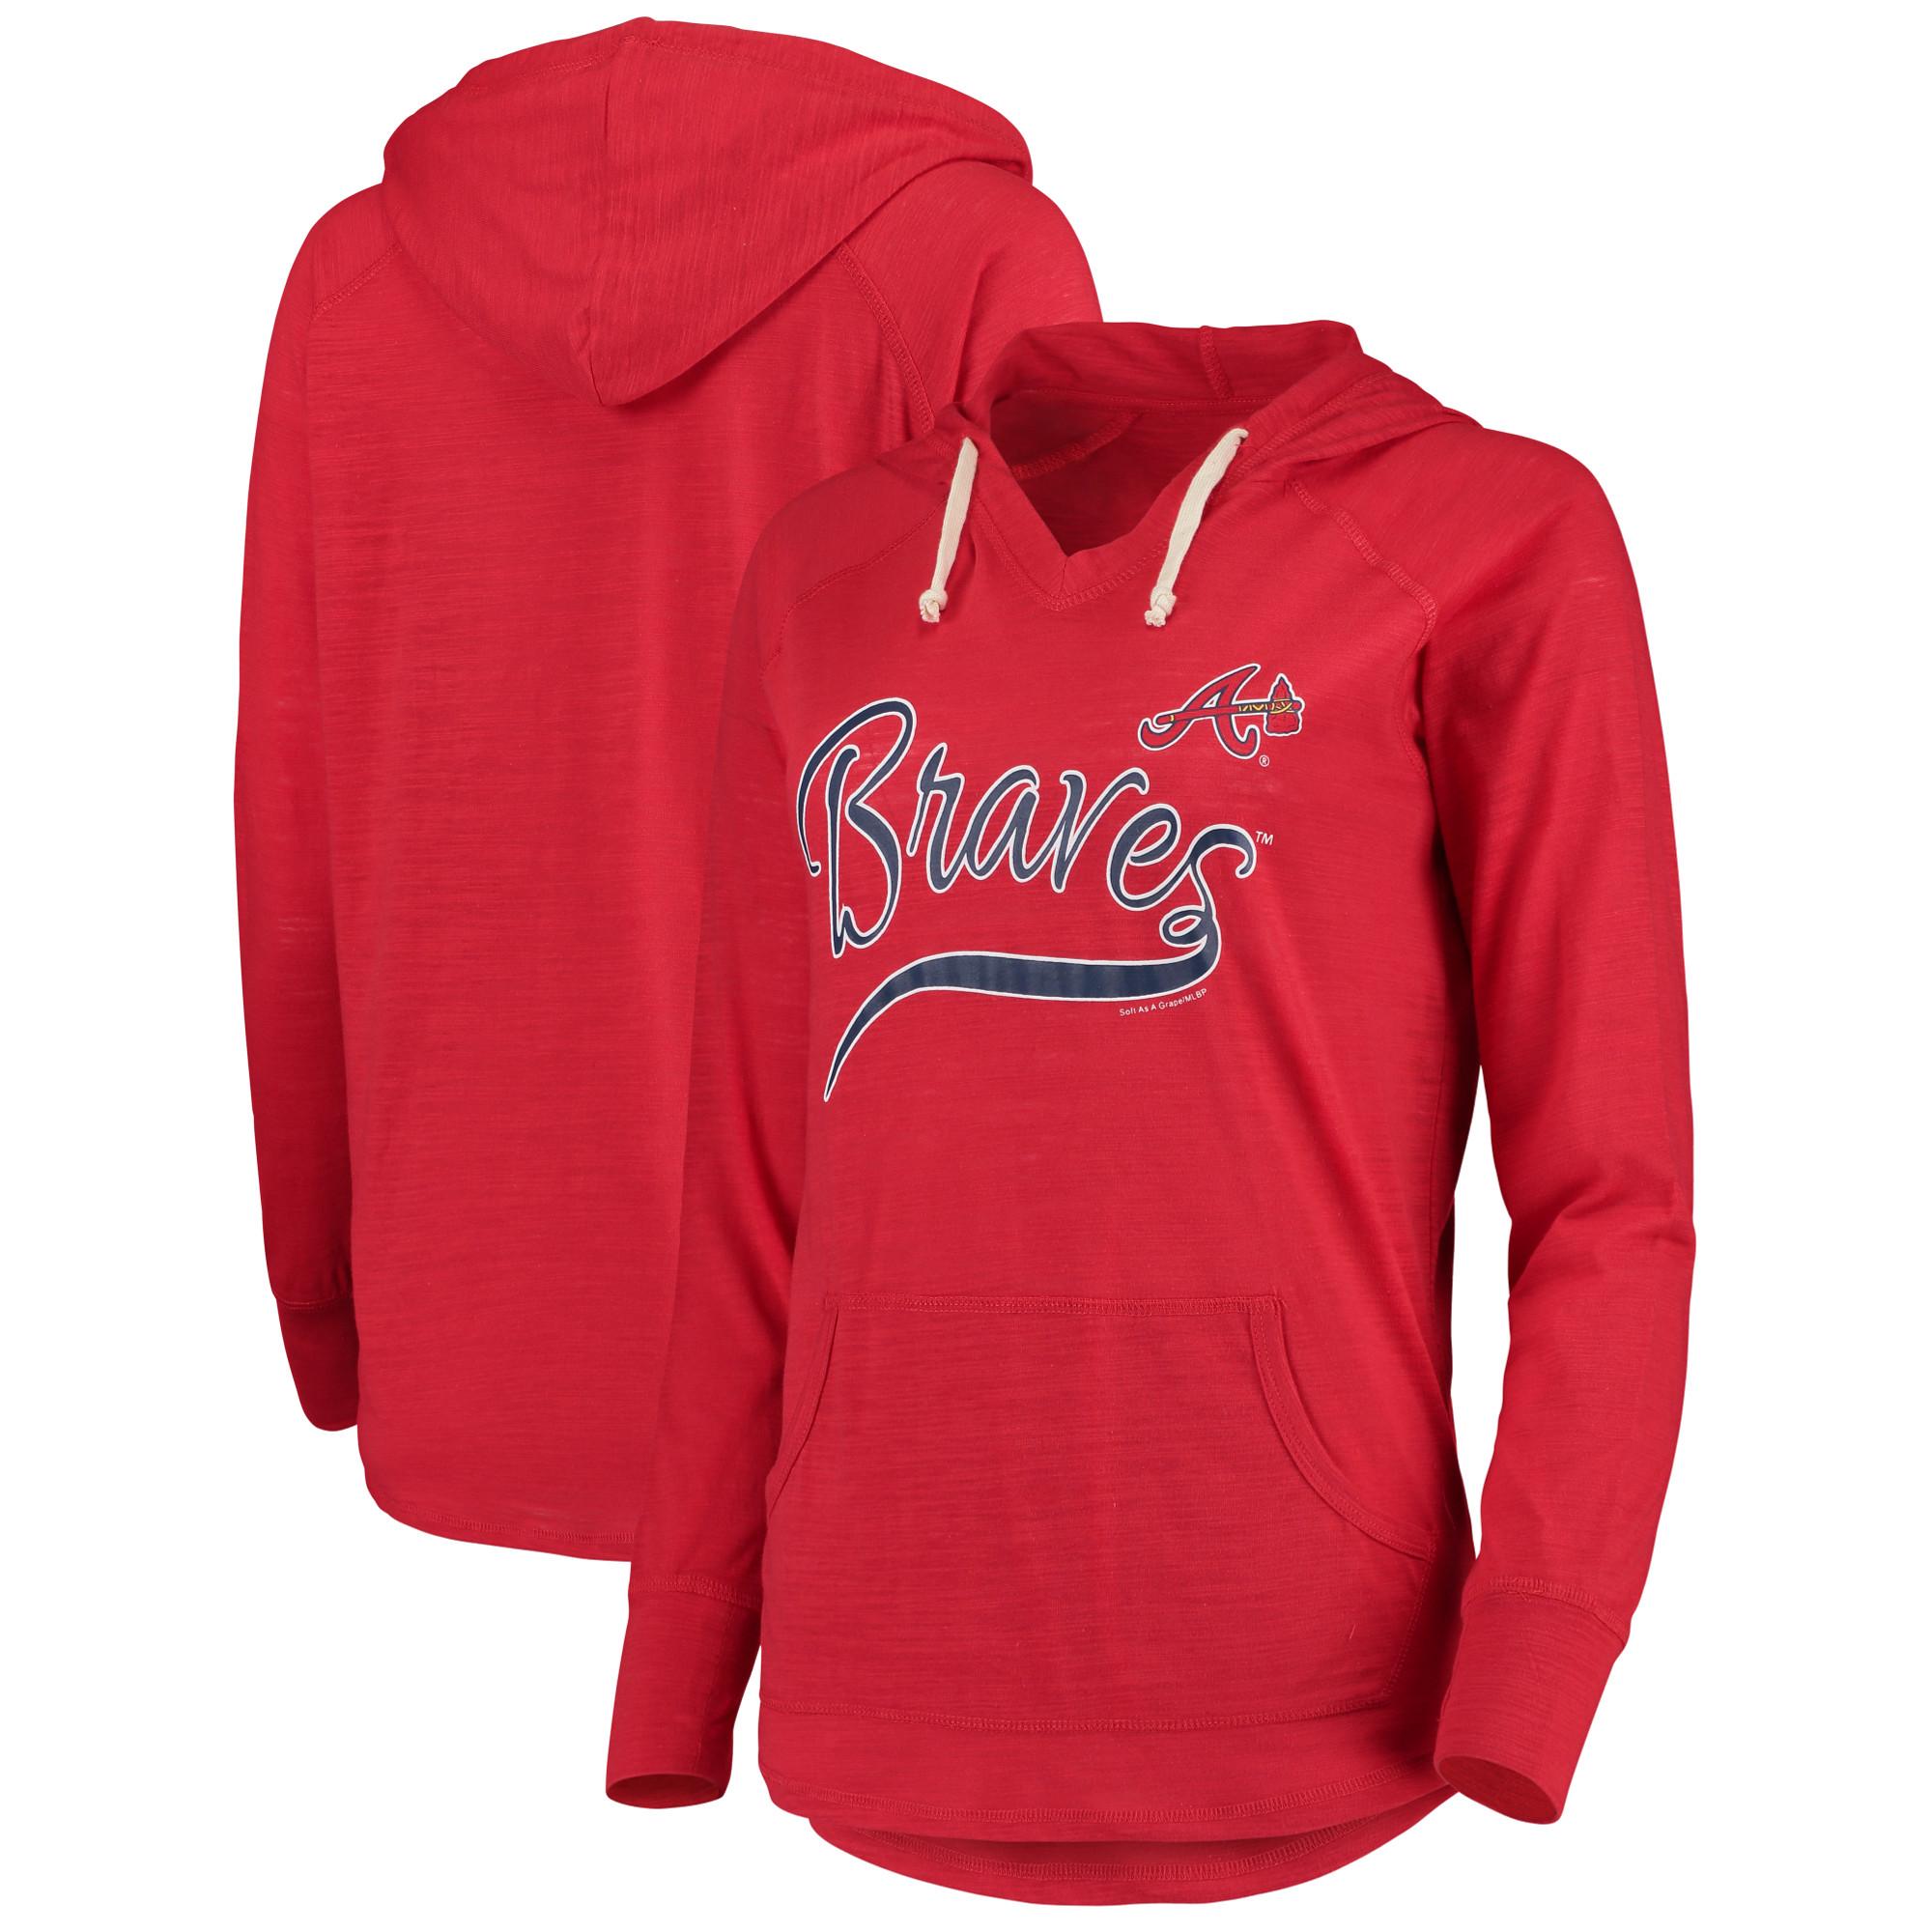 Atlanta Braves Soft As A Grape Women's Third Strike Tri-Blend V-Neck Pullover Hoodie - Red